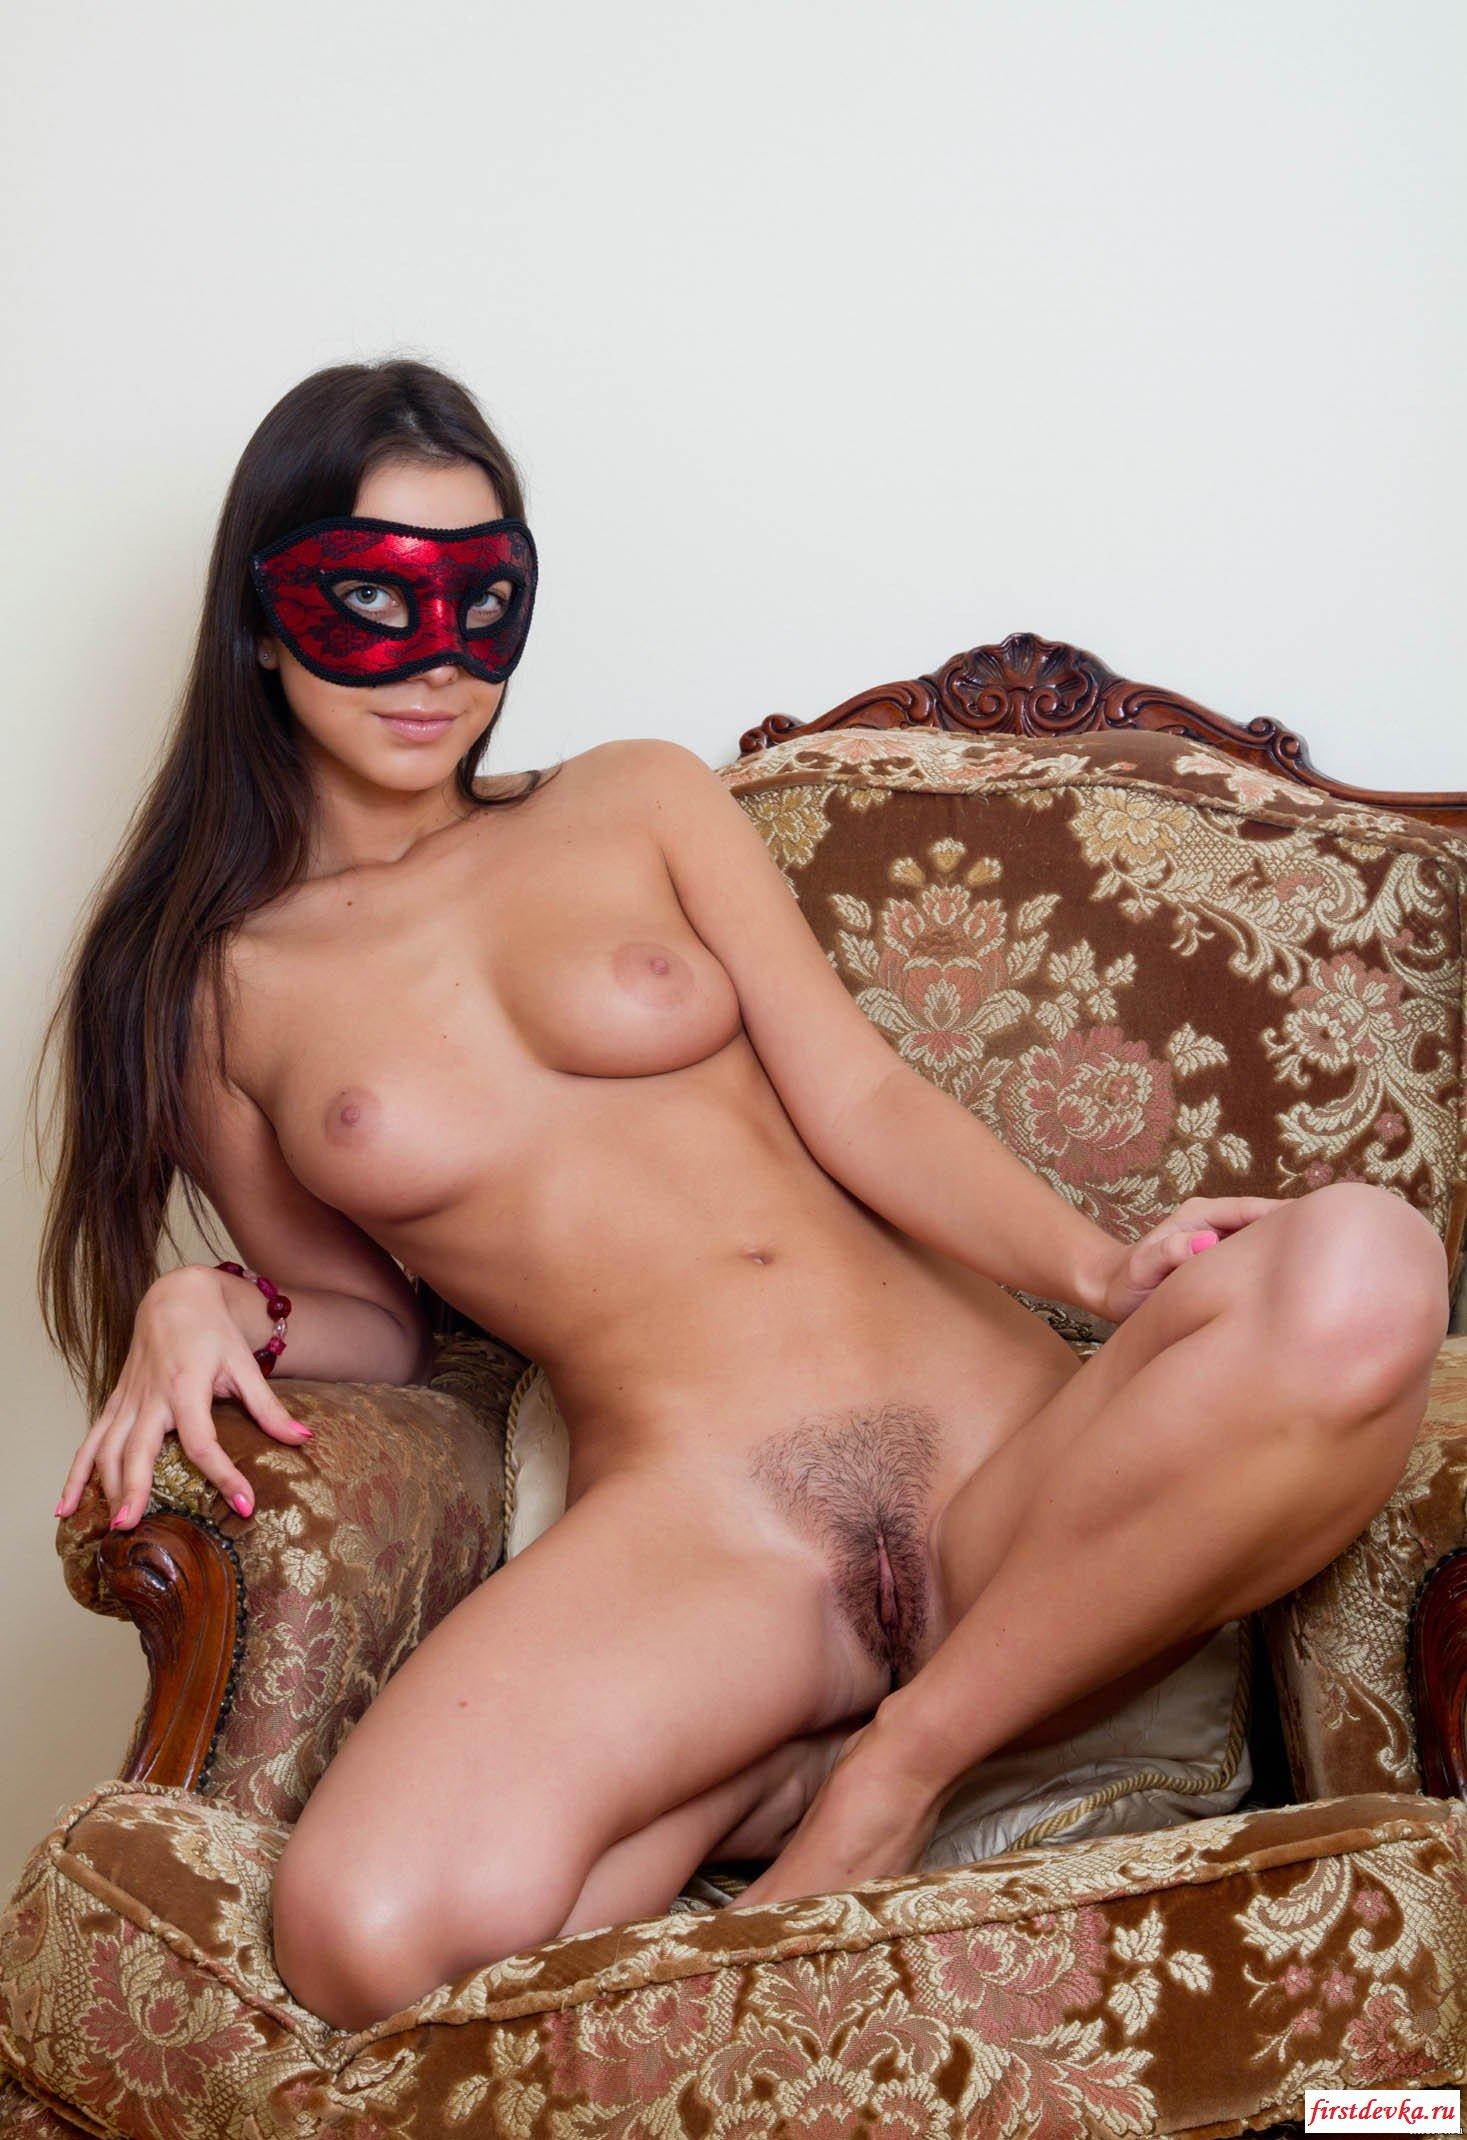 Незнакомка в маске (19 снимках)